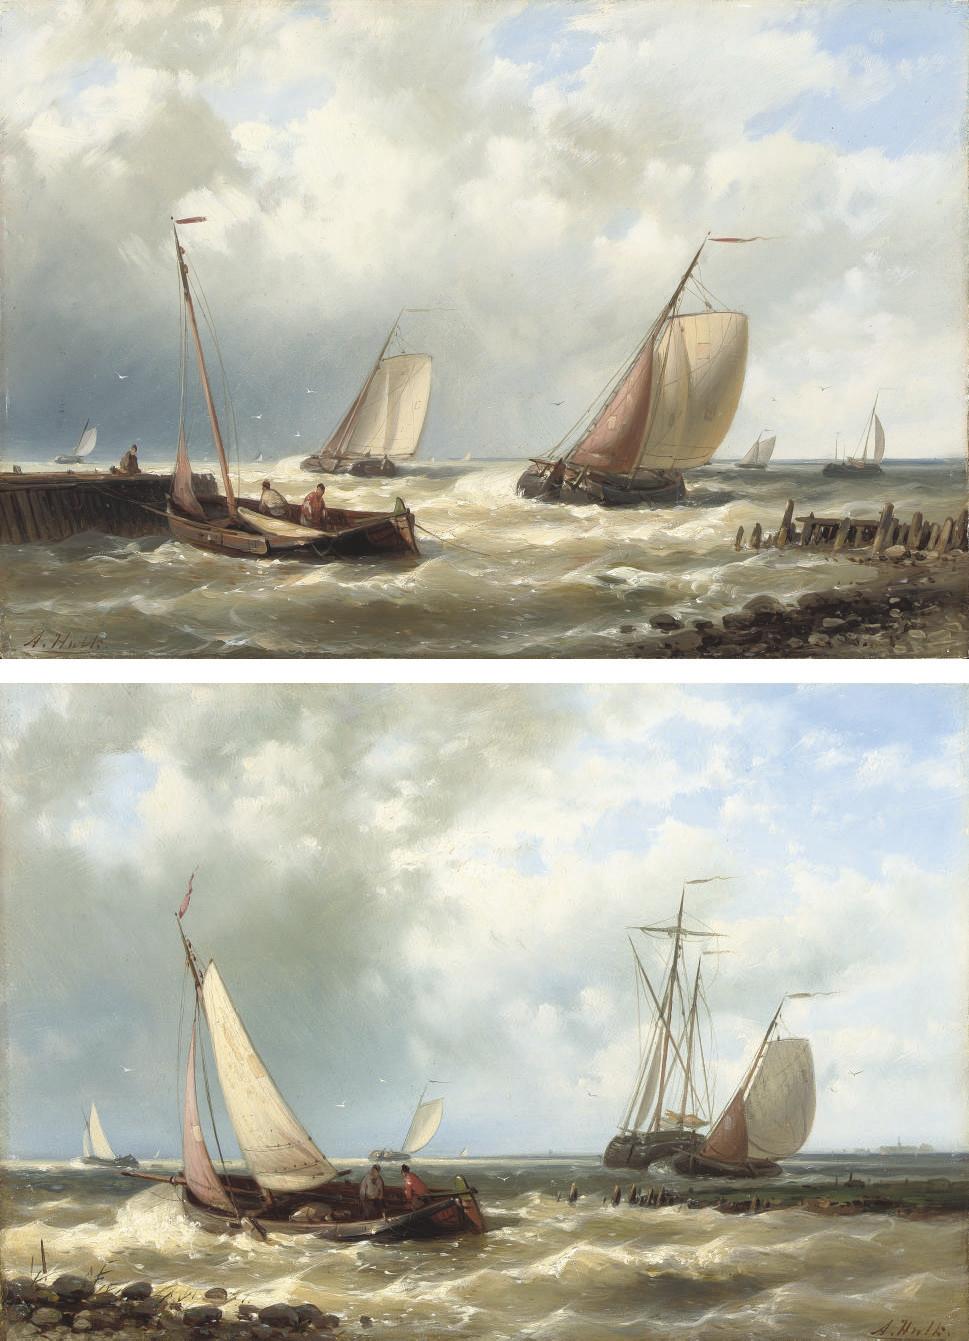 Abraham Hulk (Amsterdam 1813-1